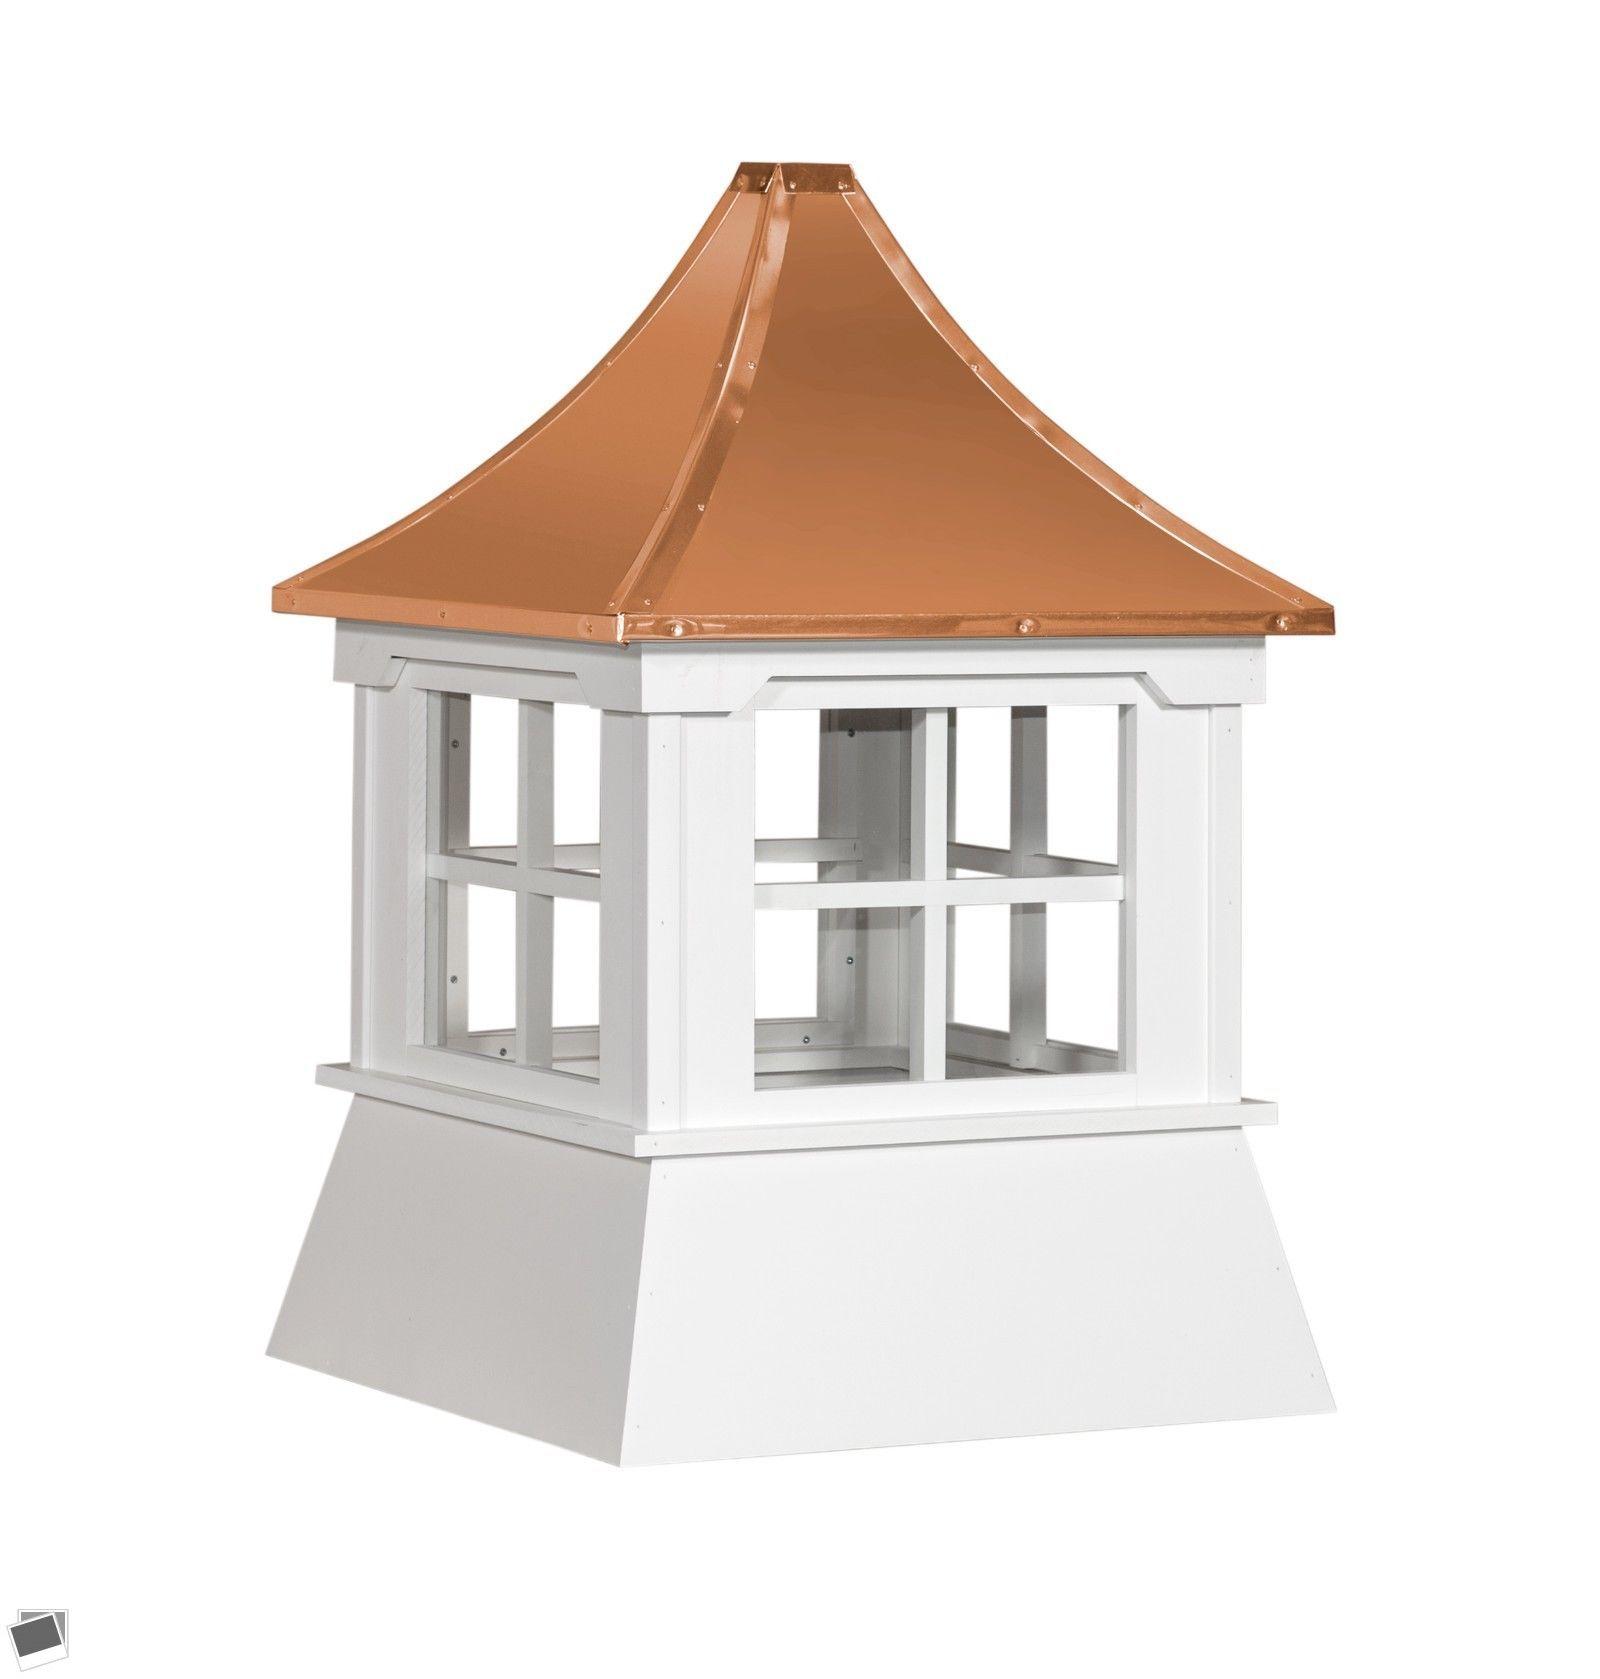 Weathervanes 20512 Cupola 30 Windows Copper Pagoda Roof Buy It Now Only 990 On Ebay Weathervanes Cupola Windows Copp Cupolas Copper Roof Vinyl Sheds